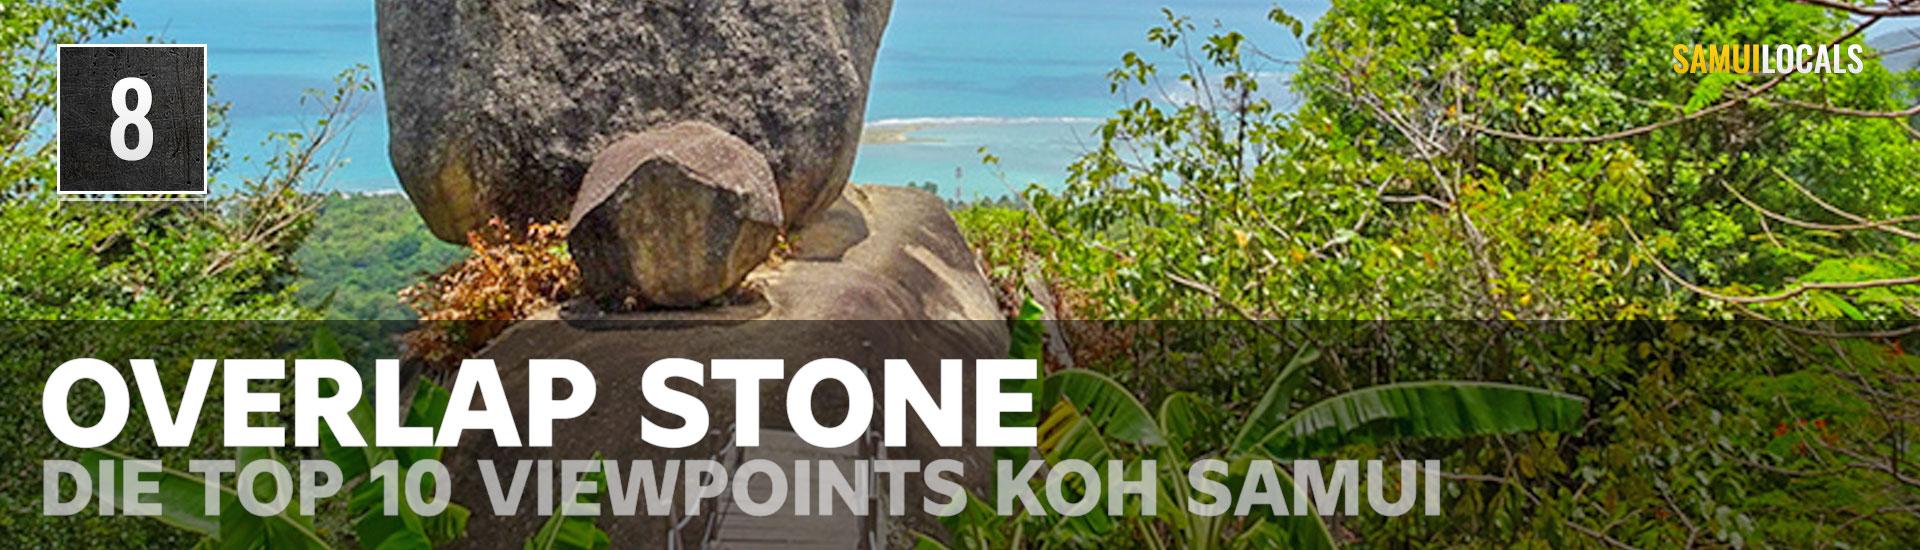 viewpoint_koh_samui_overlap_stone